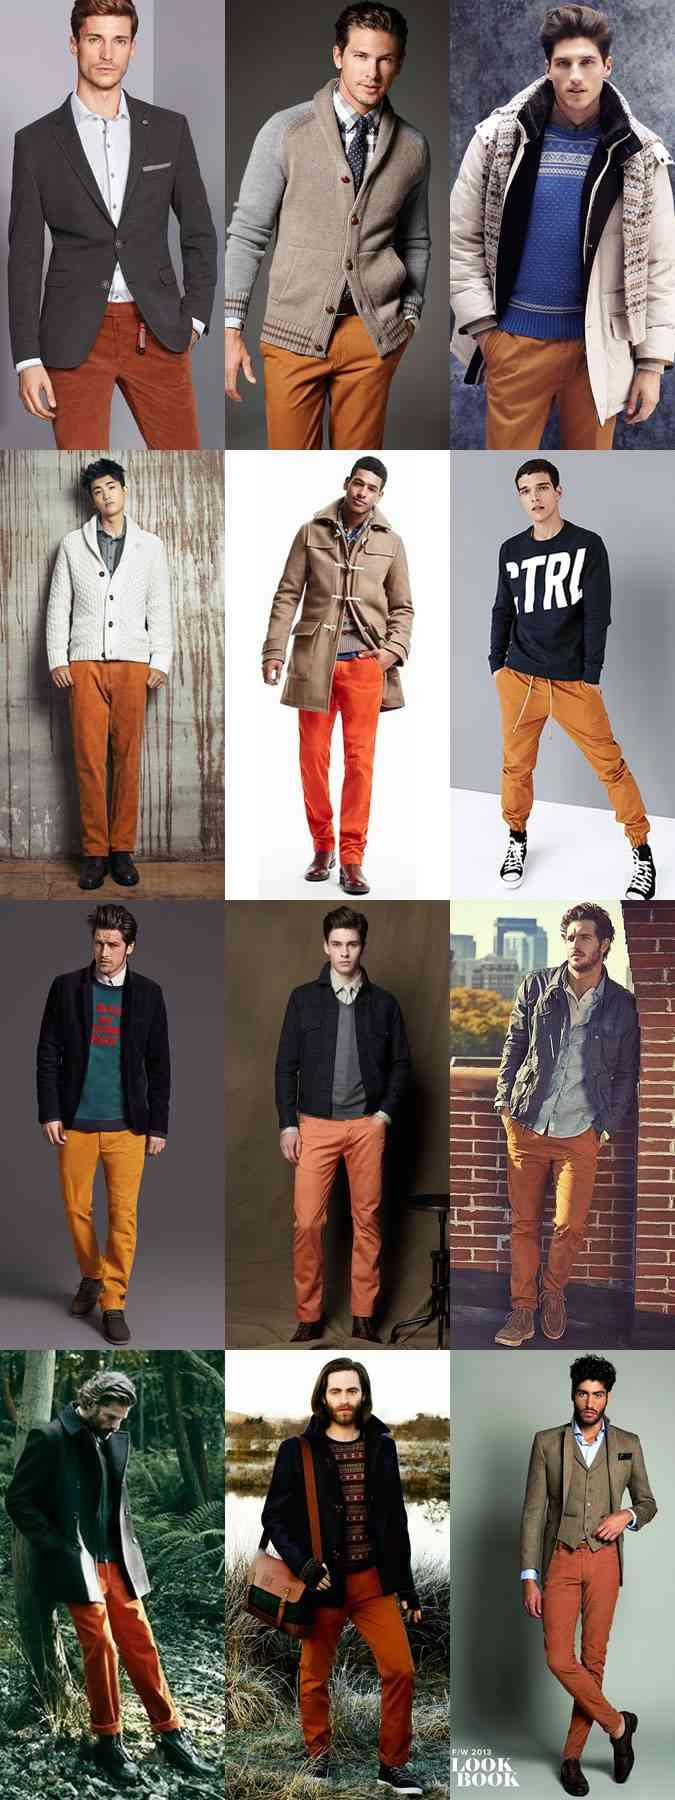 pantalonii portocalii la moda toamna 2015